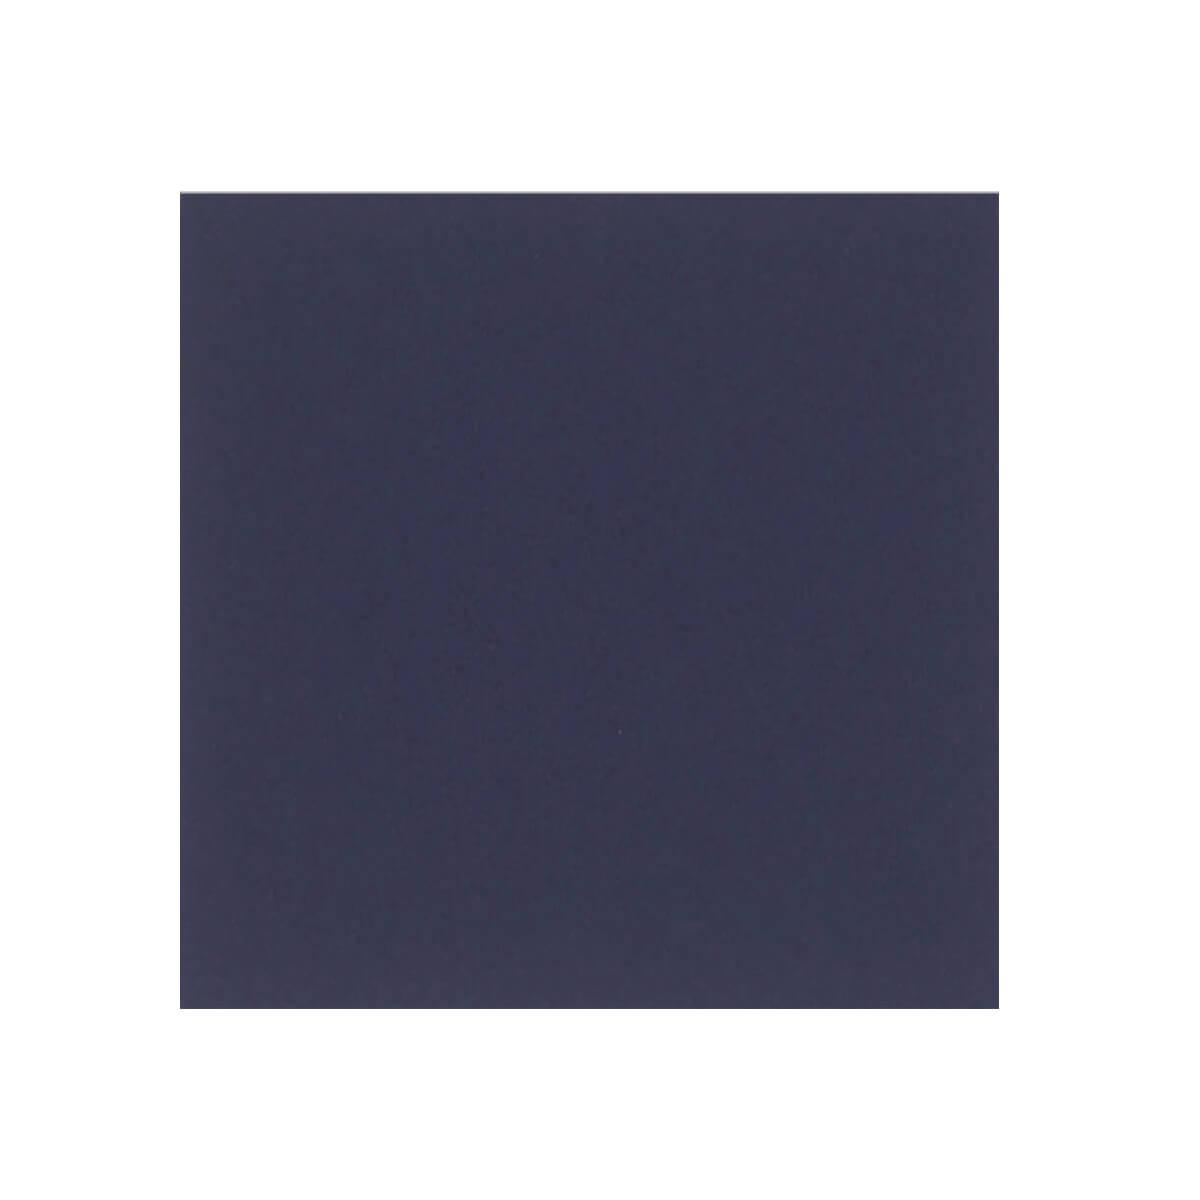 DARK BLUE 155mm SQUARE ENVELOPES 120GSM